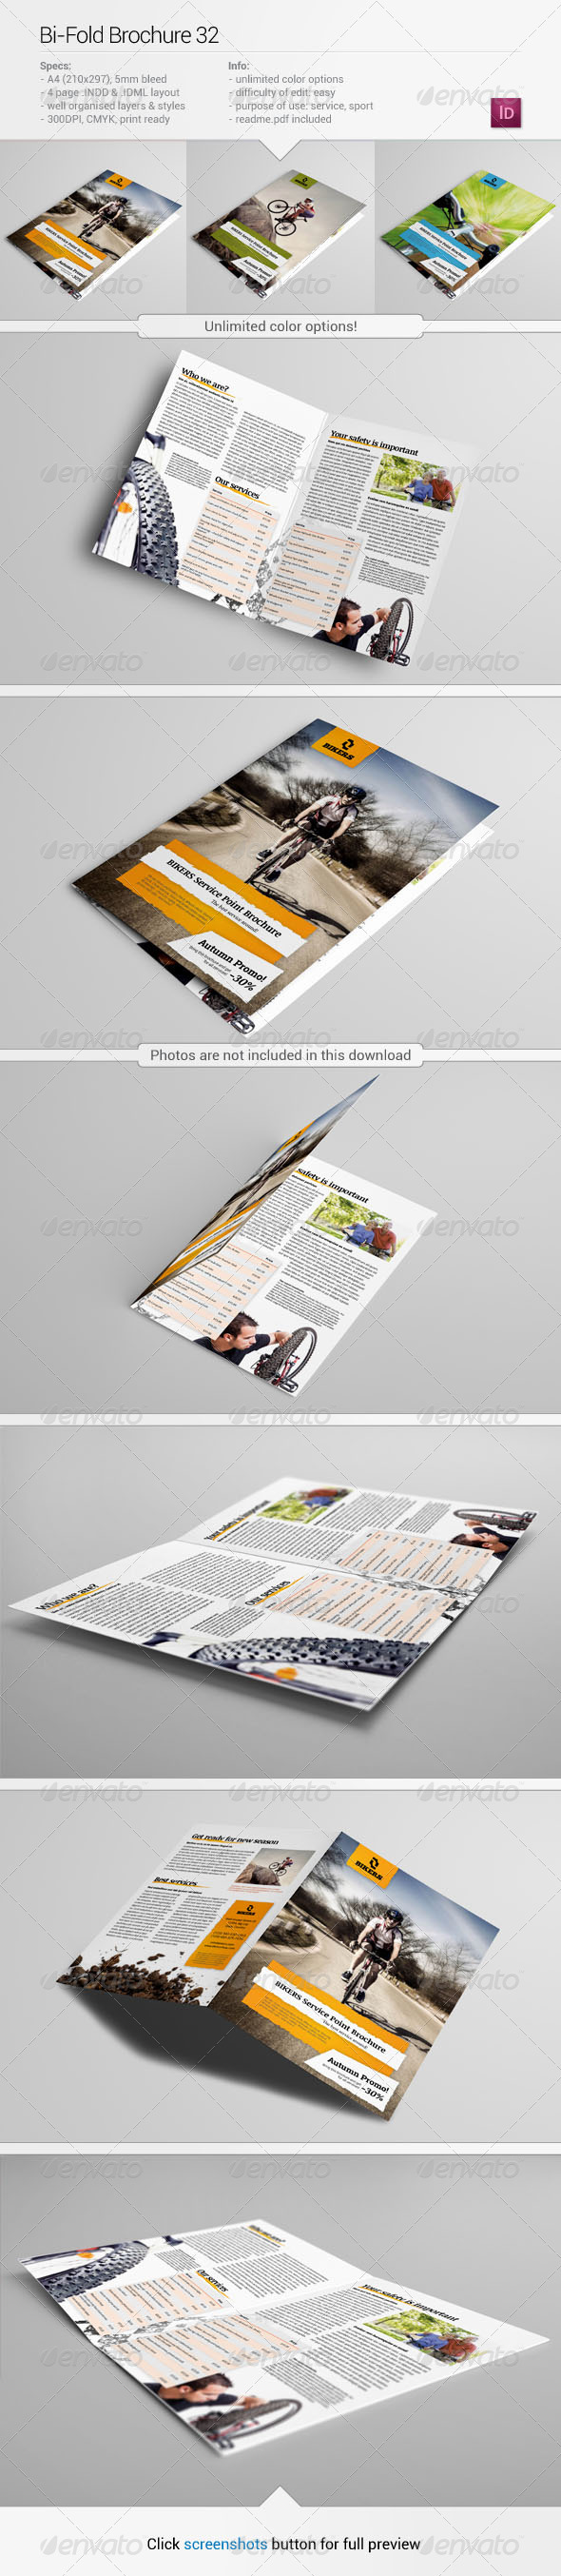 Bi-Fold Brochure 32 - Informational Brochures